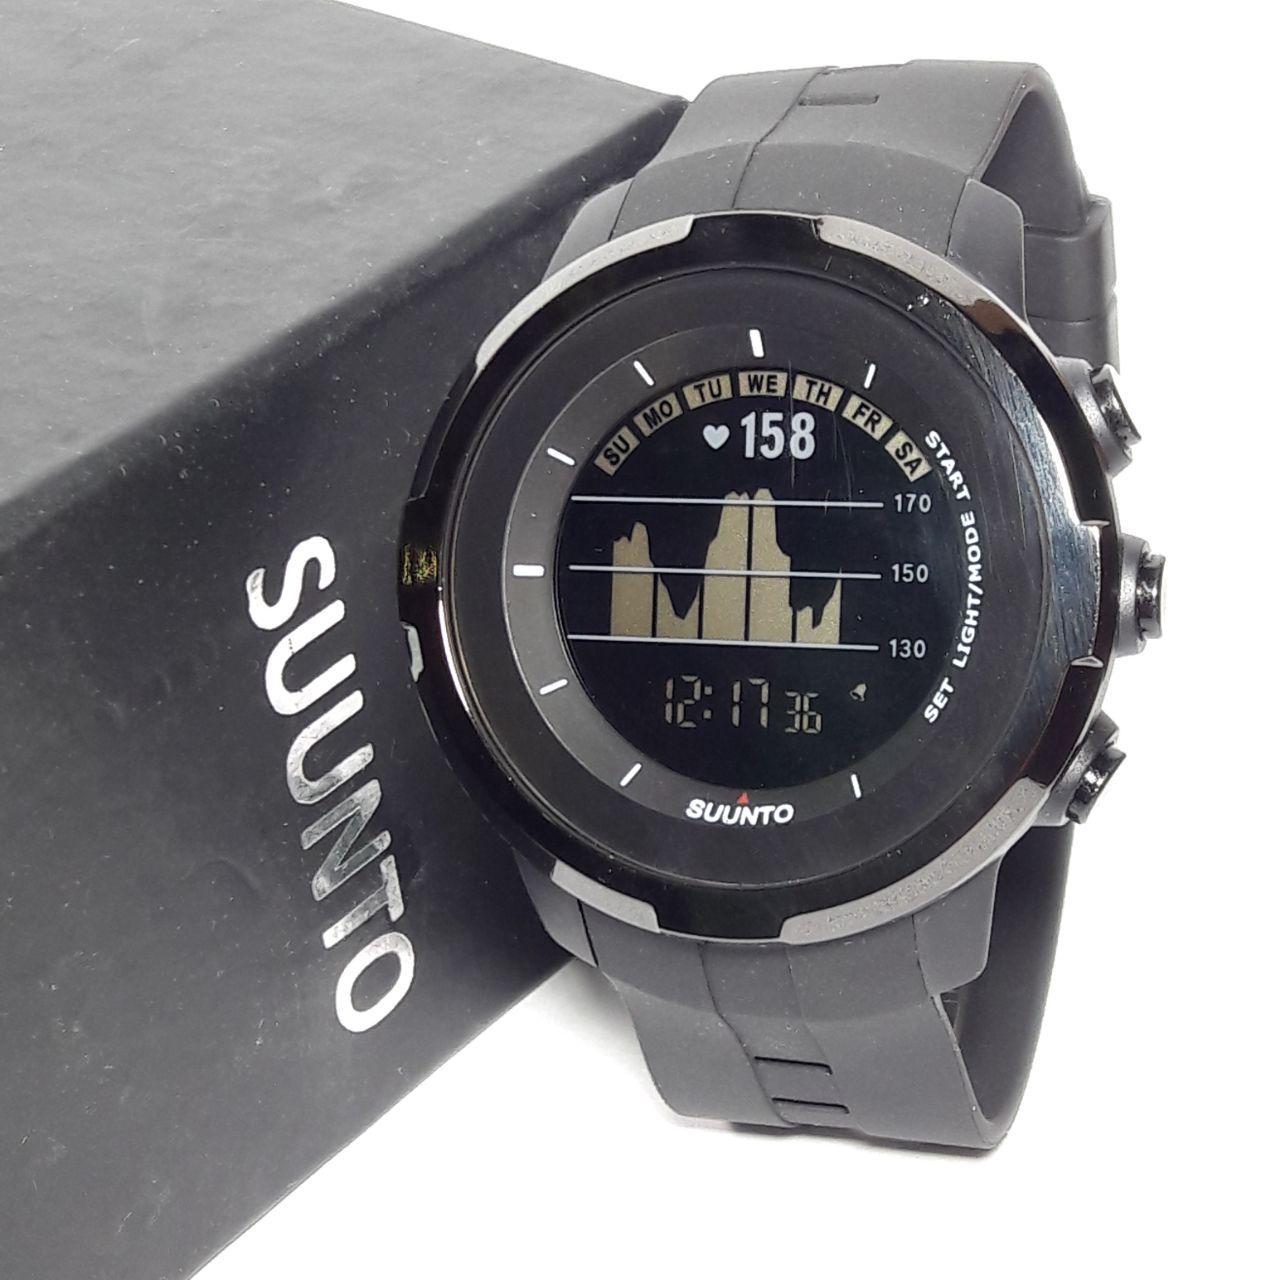 Jam tangan Pria Sunto suunto Core digital rubber black